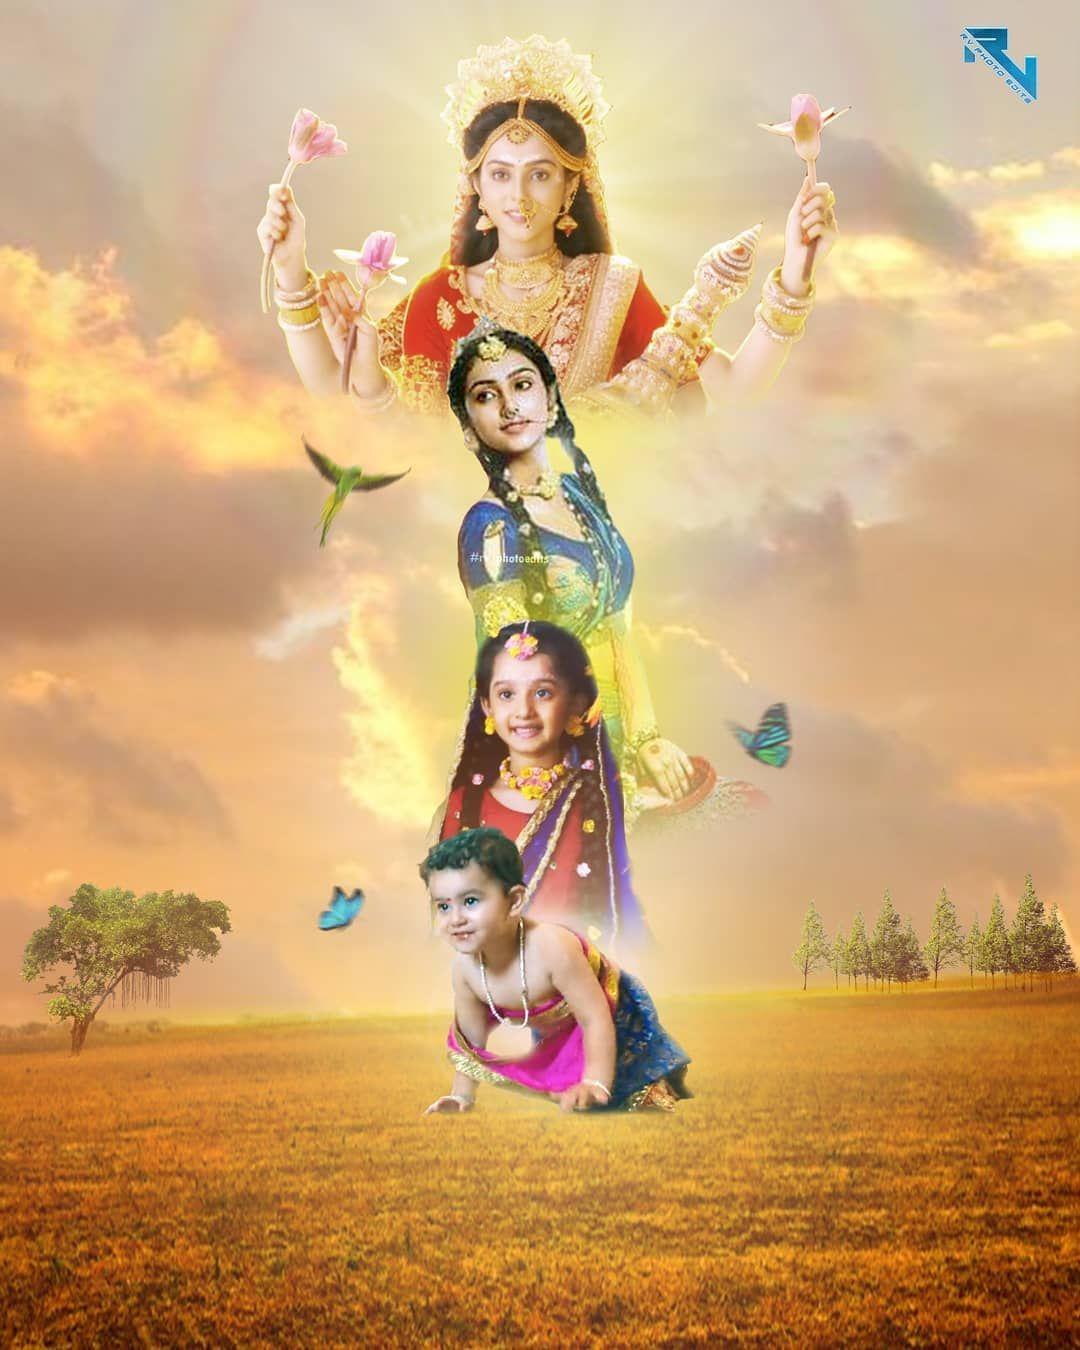 560 RADHA KRISHNA ideas   krishna, krishna pictures, radha